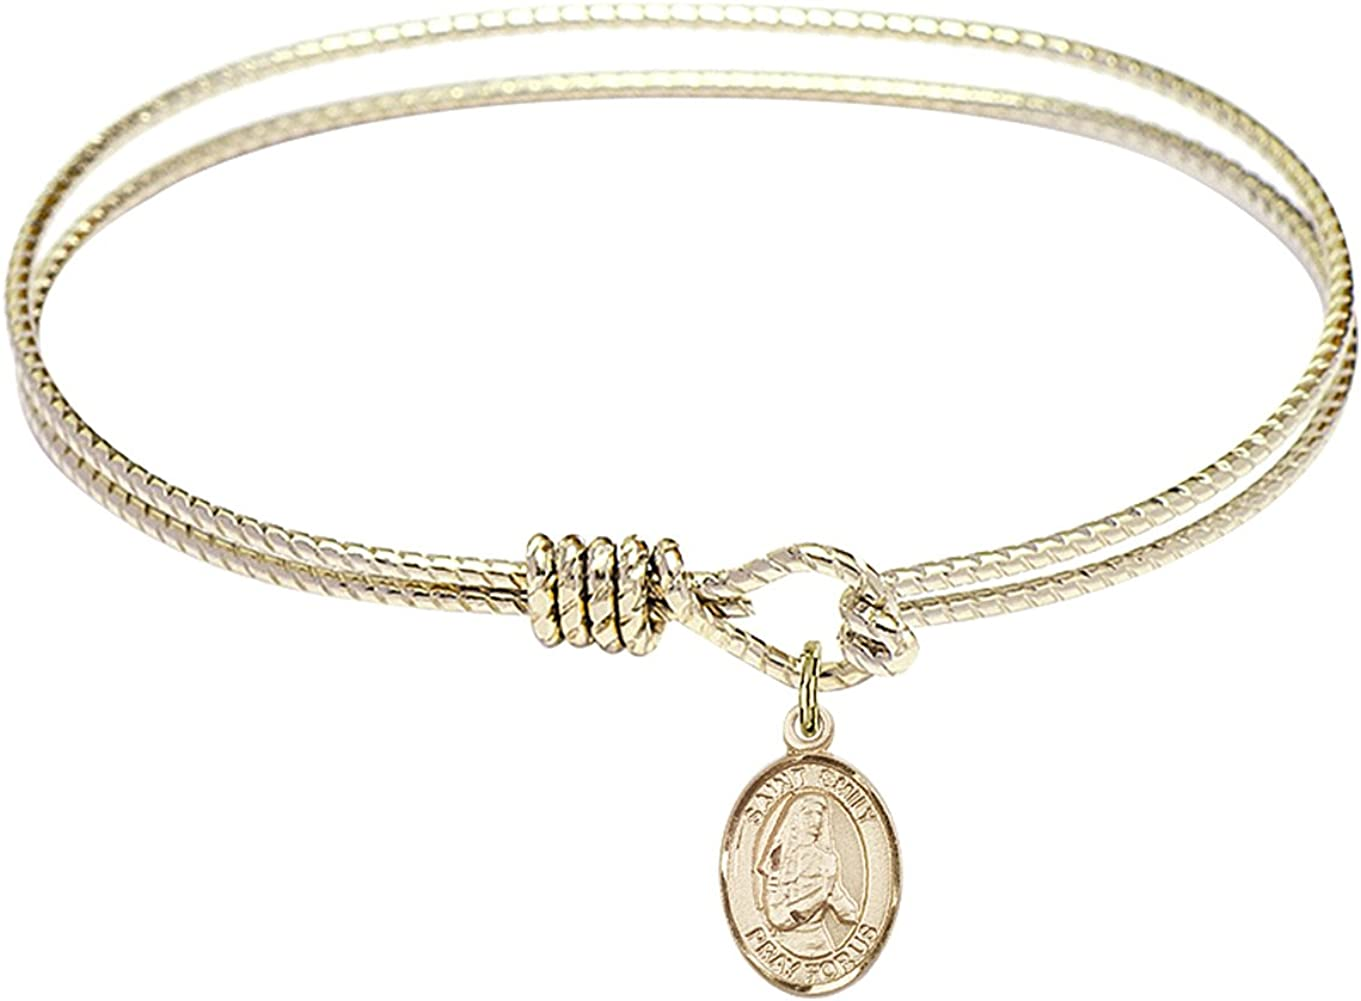 DiamondJewelryNY Eye Hook Bangle Bracelet with a St. Emily de Vialar Charm.